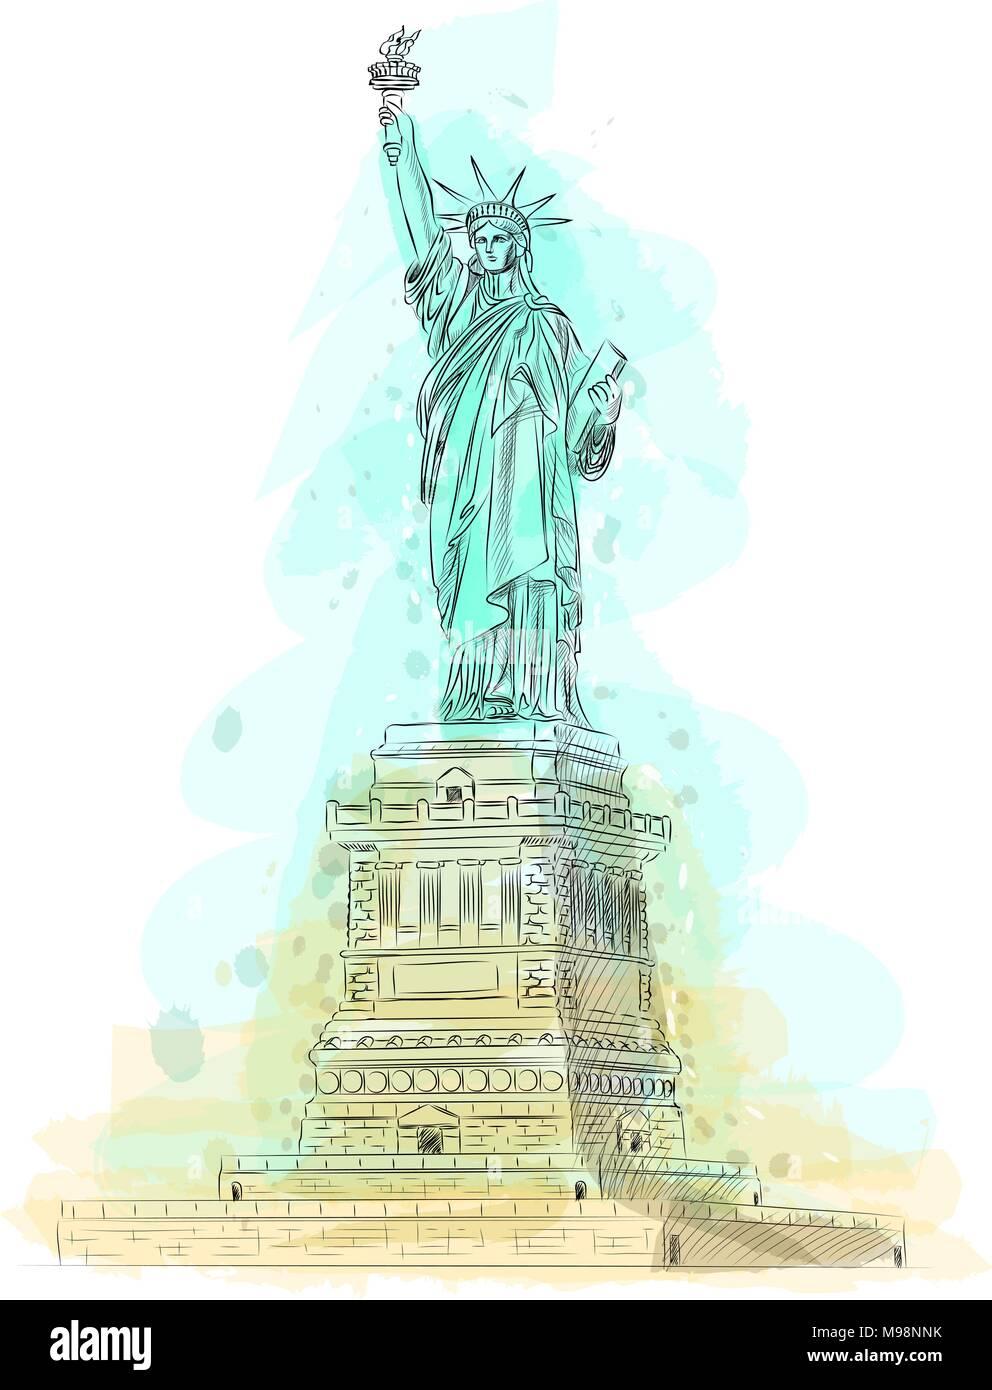 Illustration Lady Statue Liberty Torch Stockfotos & Illustration ...